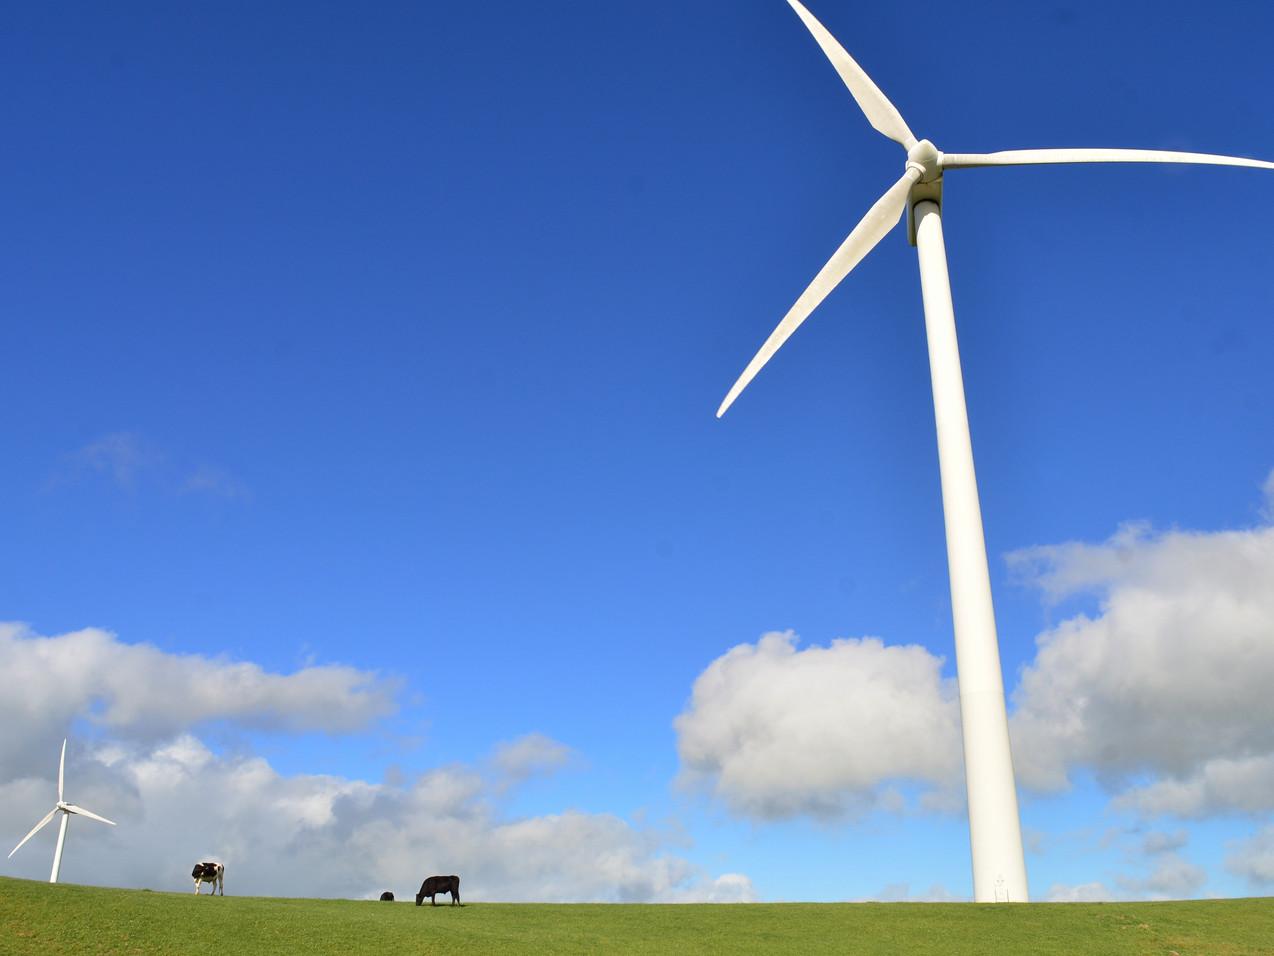 Hepburn Community Wind Park